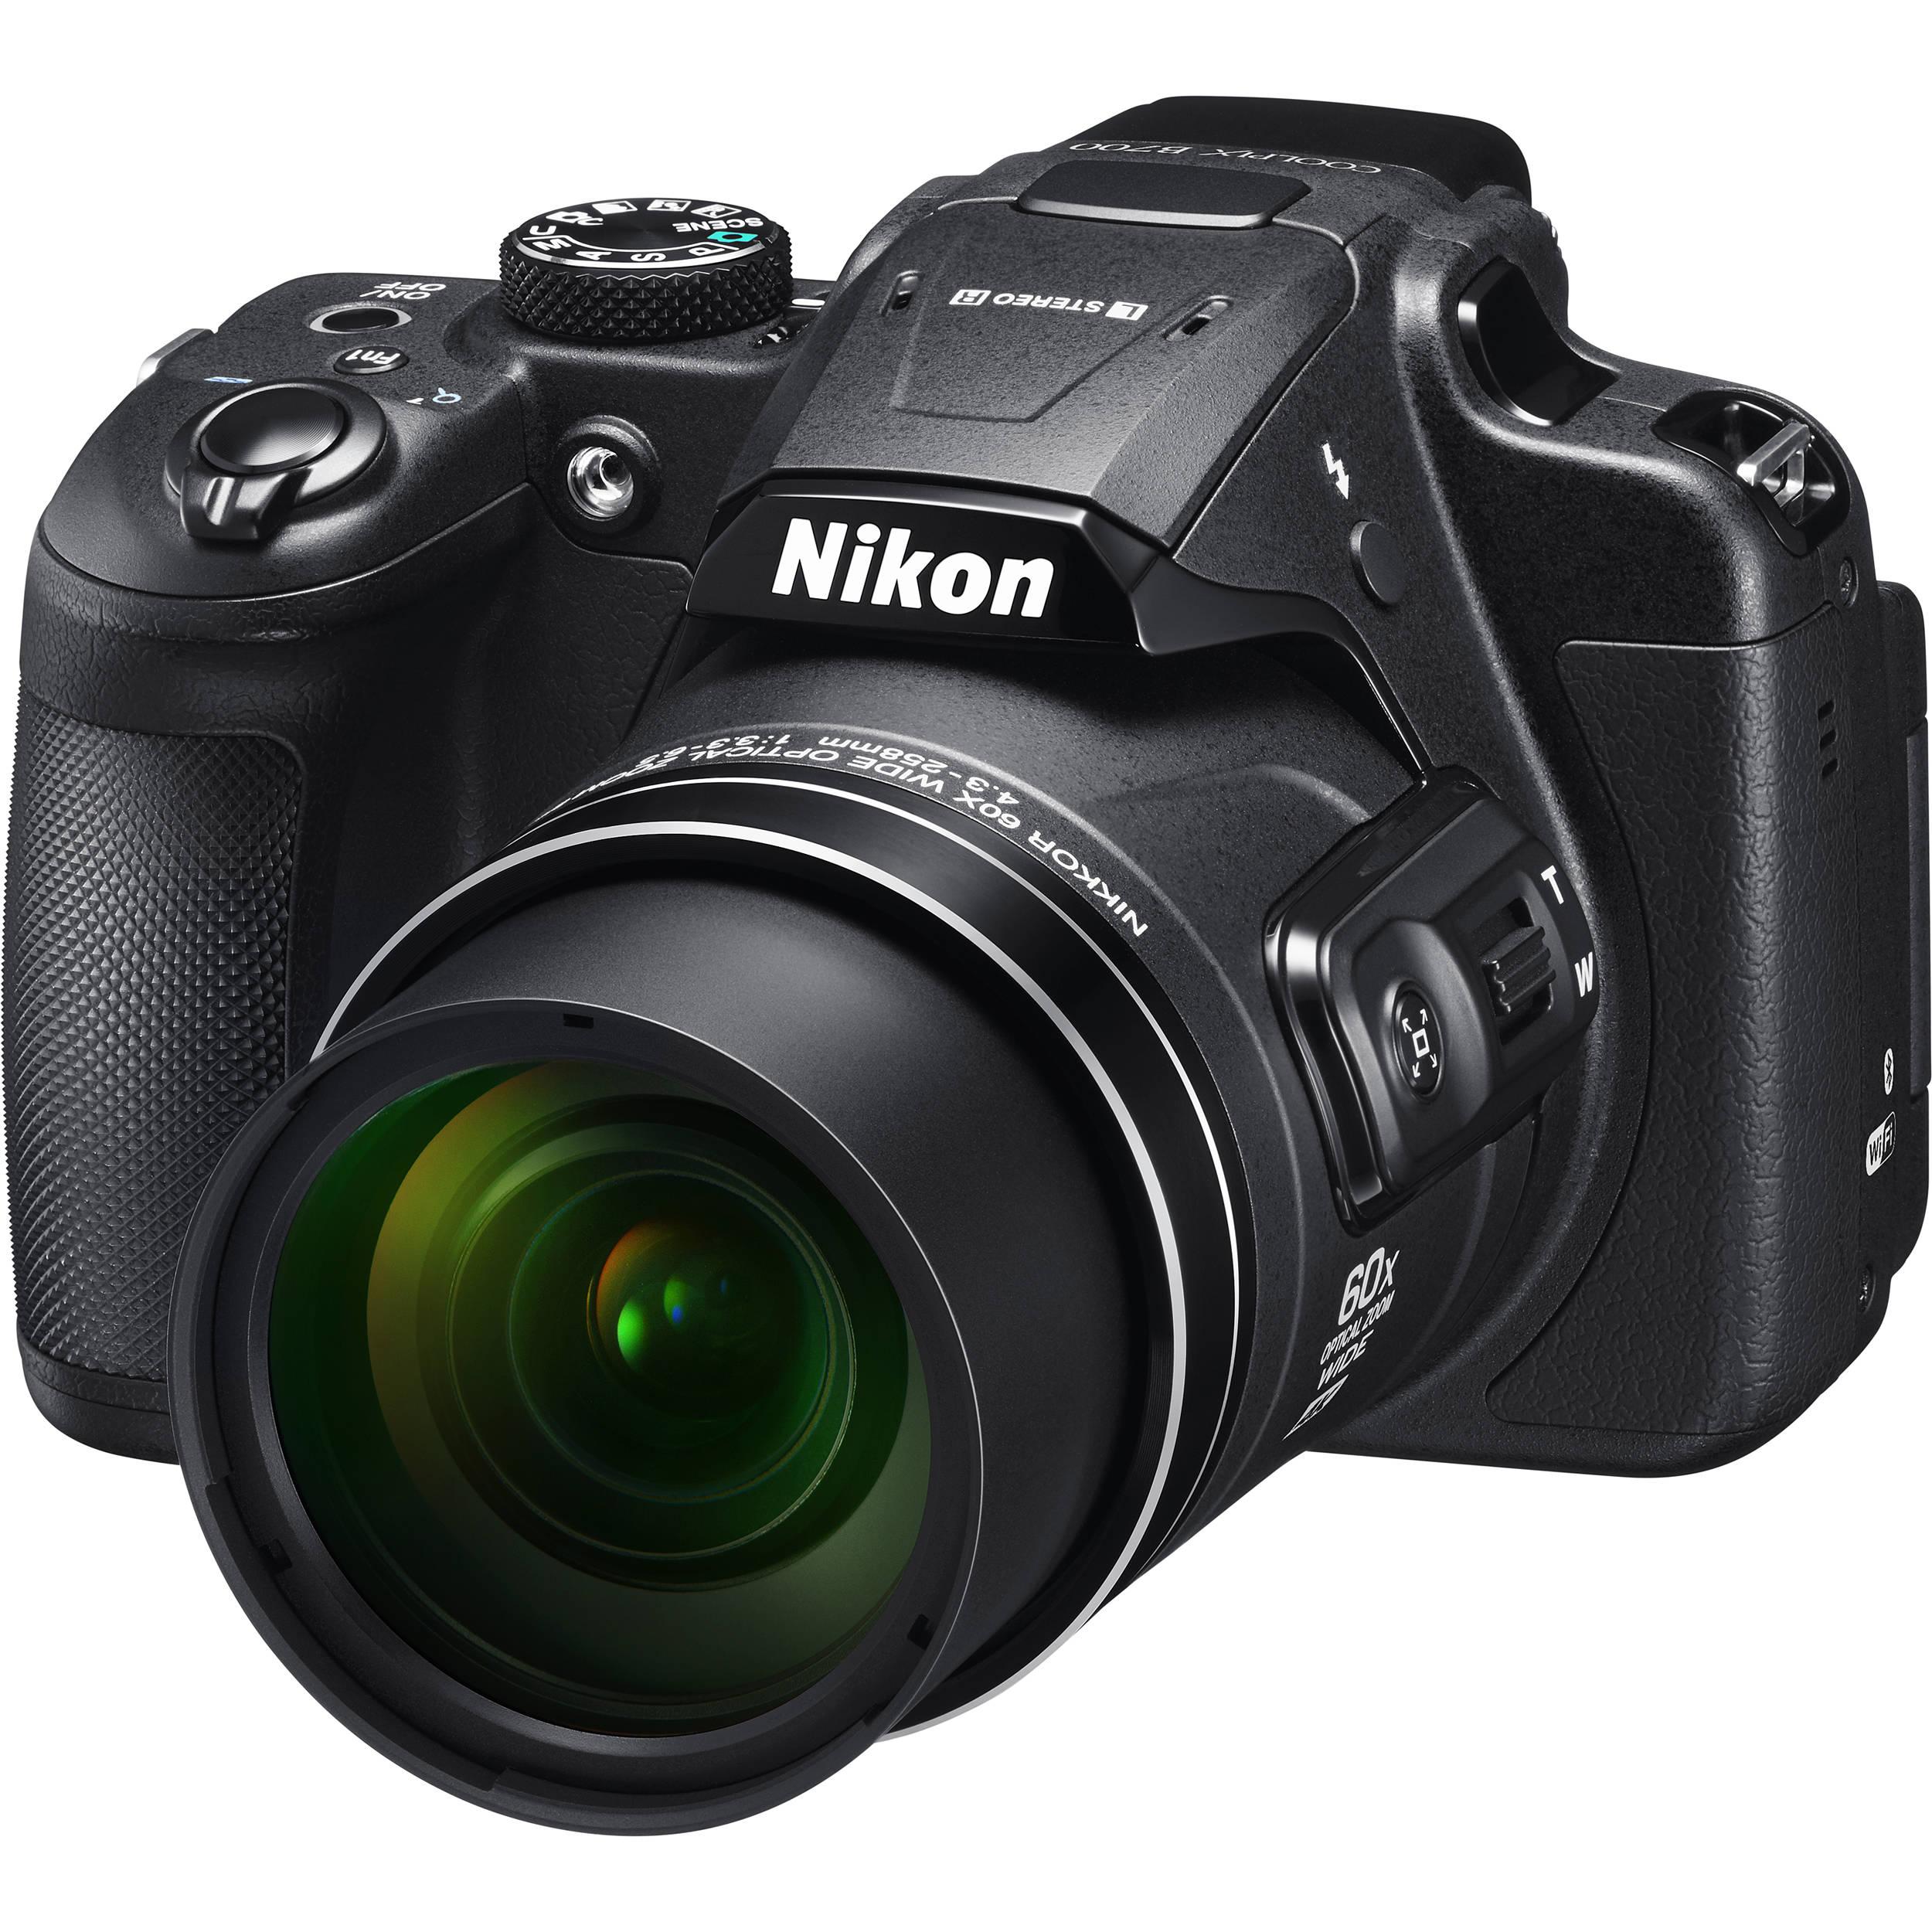 Nikon COOLPIX B700 Digital Camera 26510 B&H Photo Video